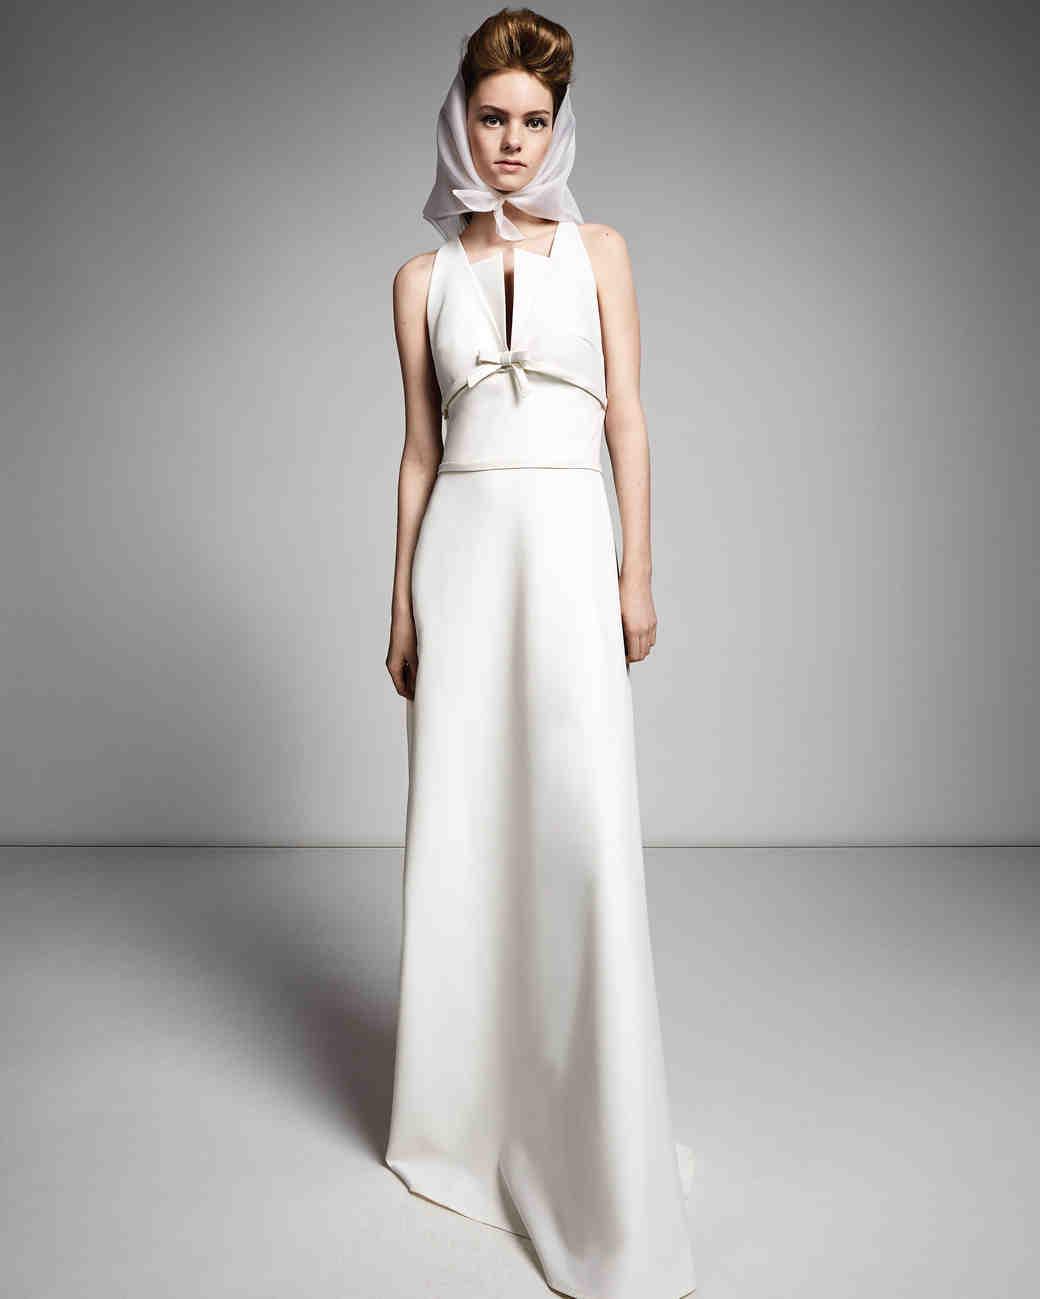 a4e0cae5fec Viktor Rolf Mariage Fall 2019 Wedding Dress Collection